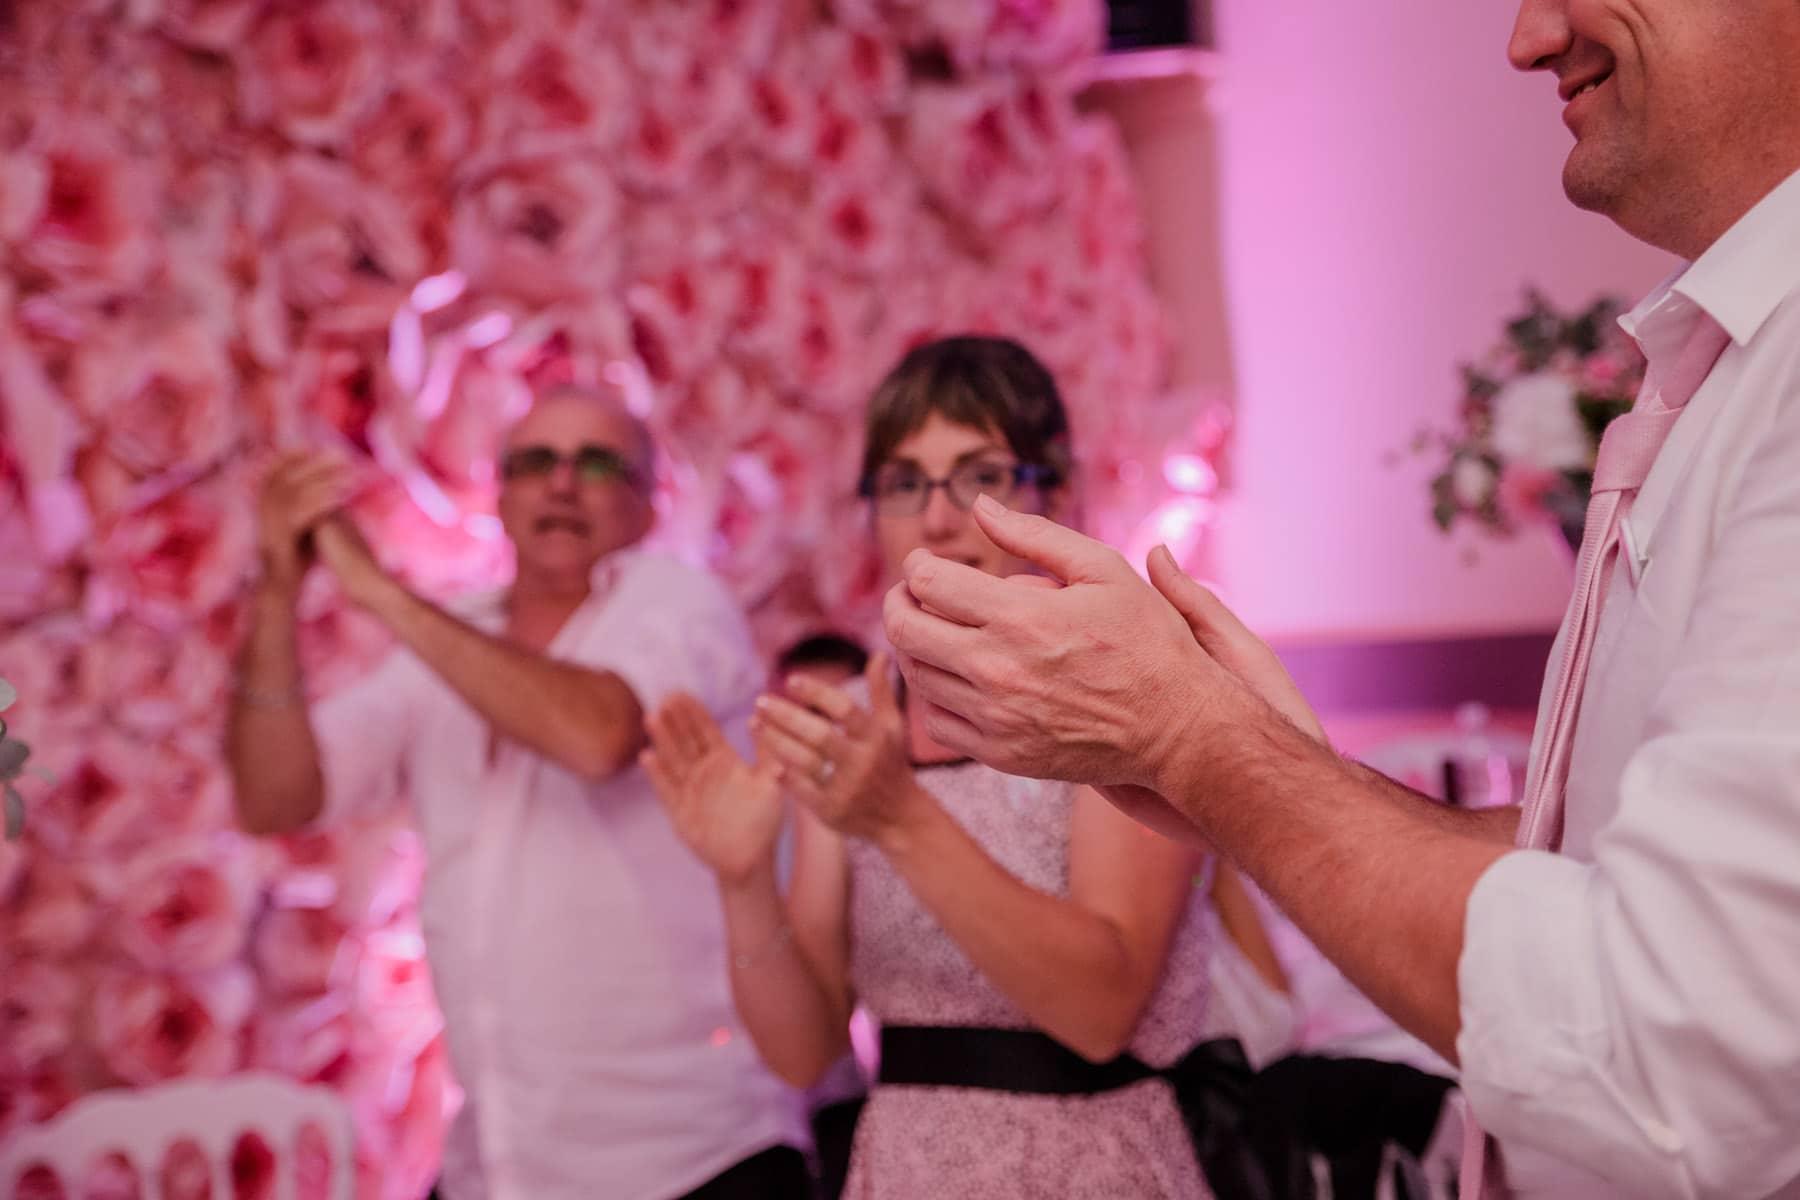 photographe mariage bordeaux landes fineart francais sarah miramon blog 47